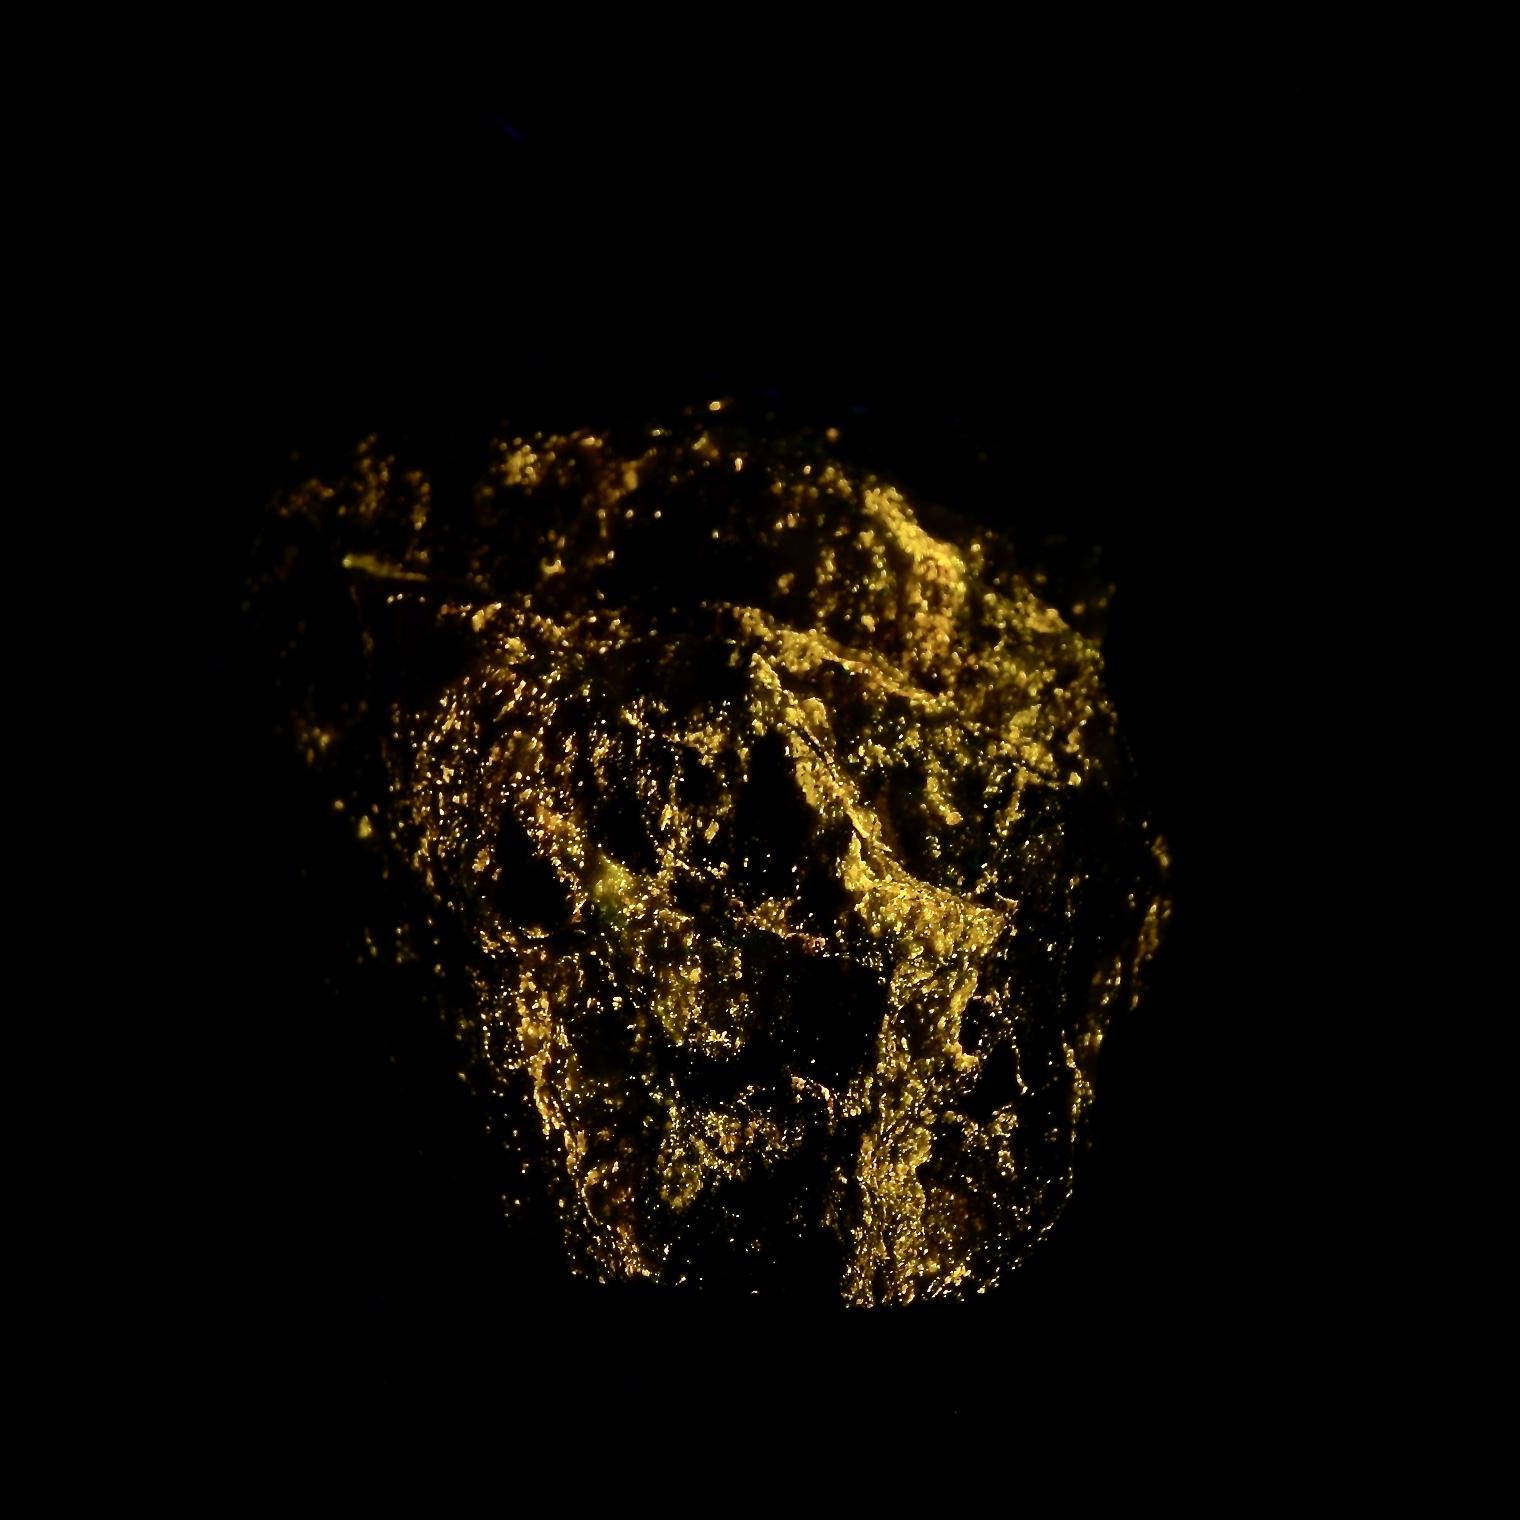 Colección de Minerales Fluorescentes - Página 5 Fullsi46